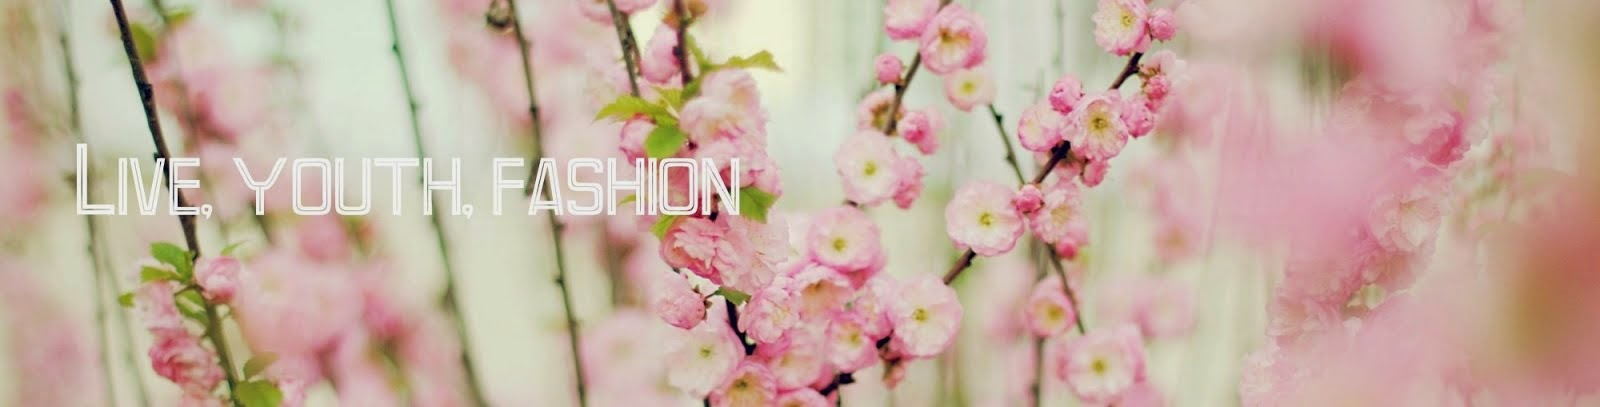 Life, youth, fashion